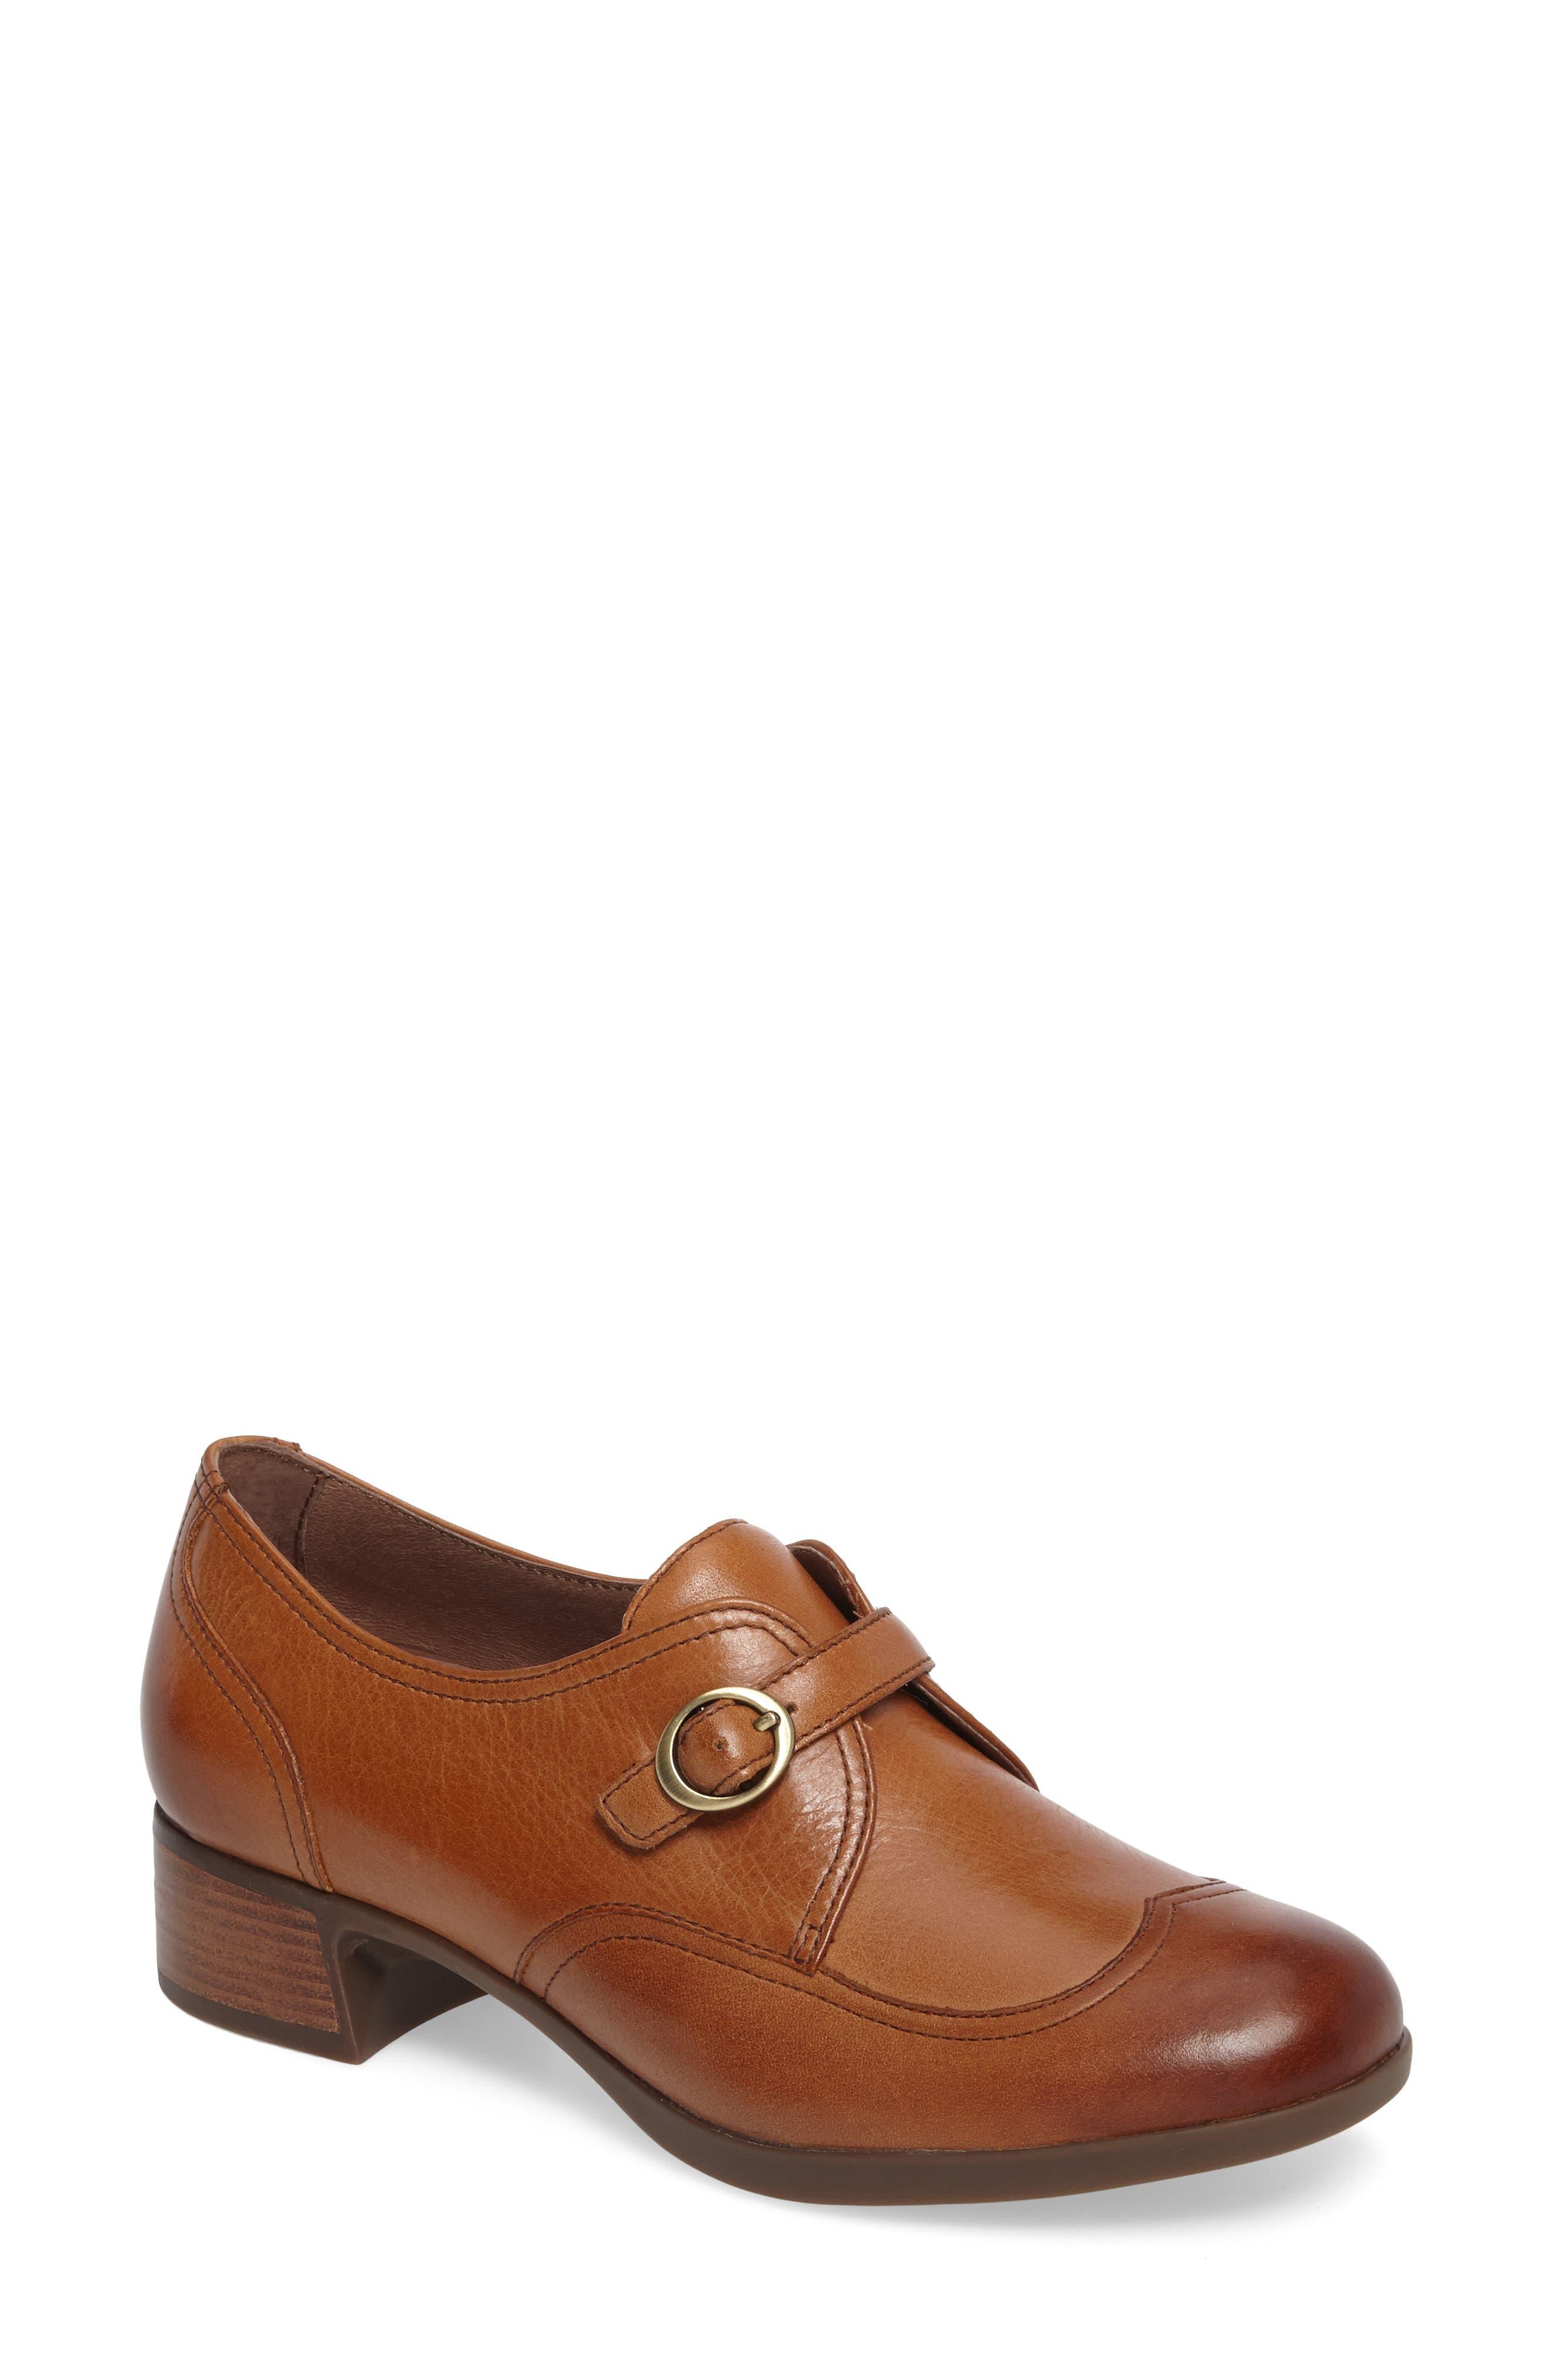 Livie Wingtip Oxford,                             Main thumbnail 1, color,                             Saddle Burnished Nappa Leather